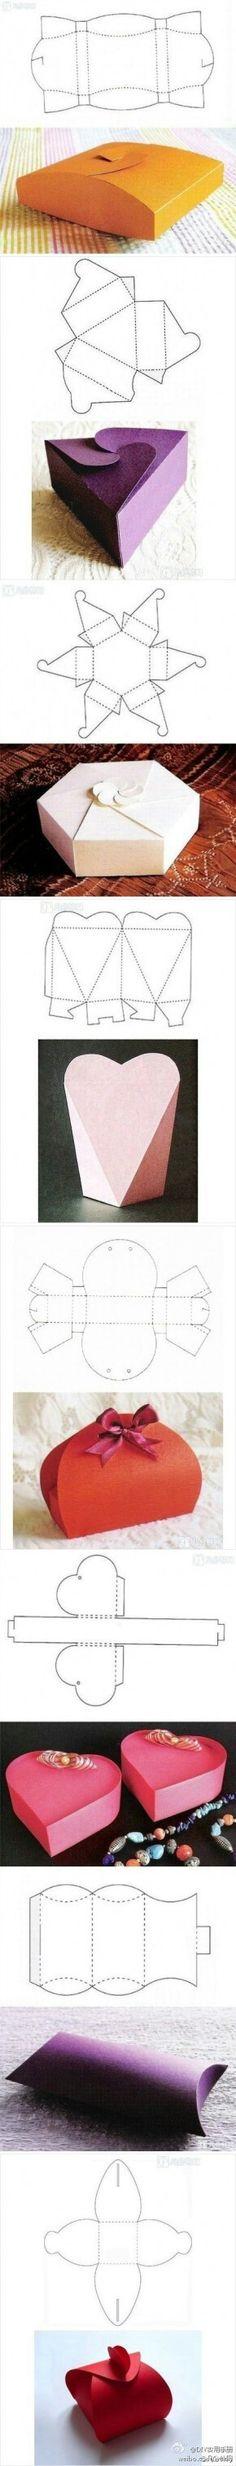 Kadodoosjes kadobon (idee) inpaktip